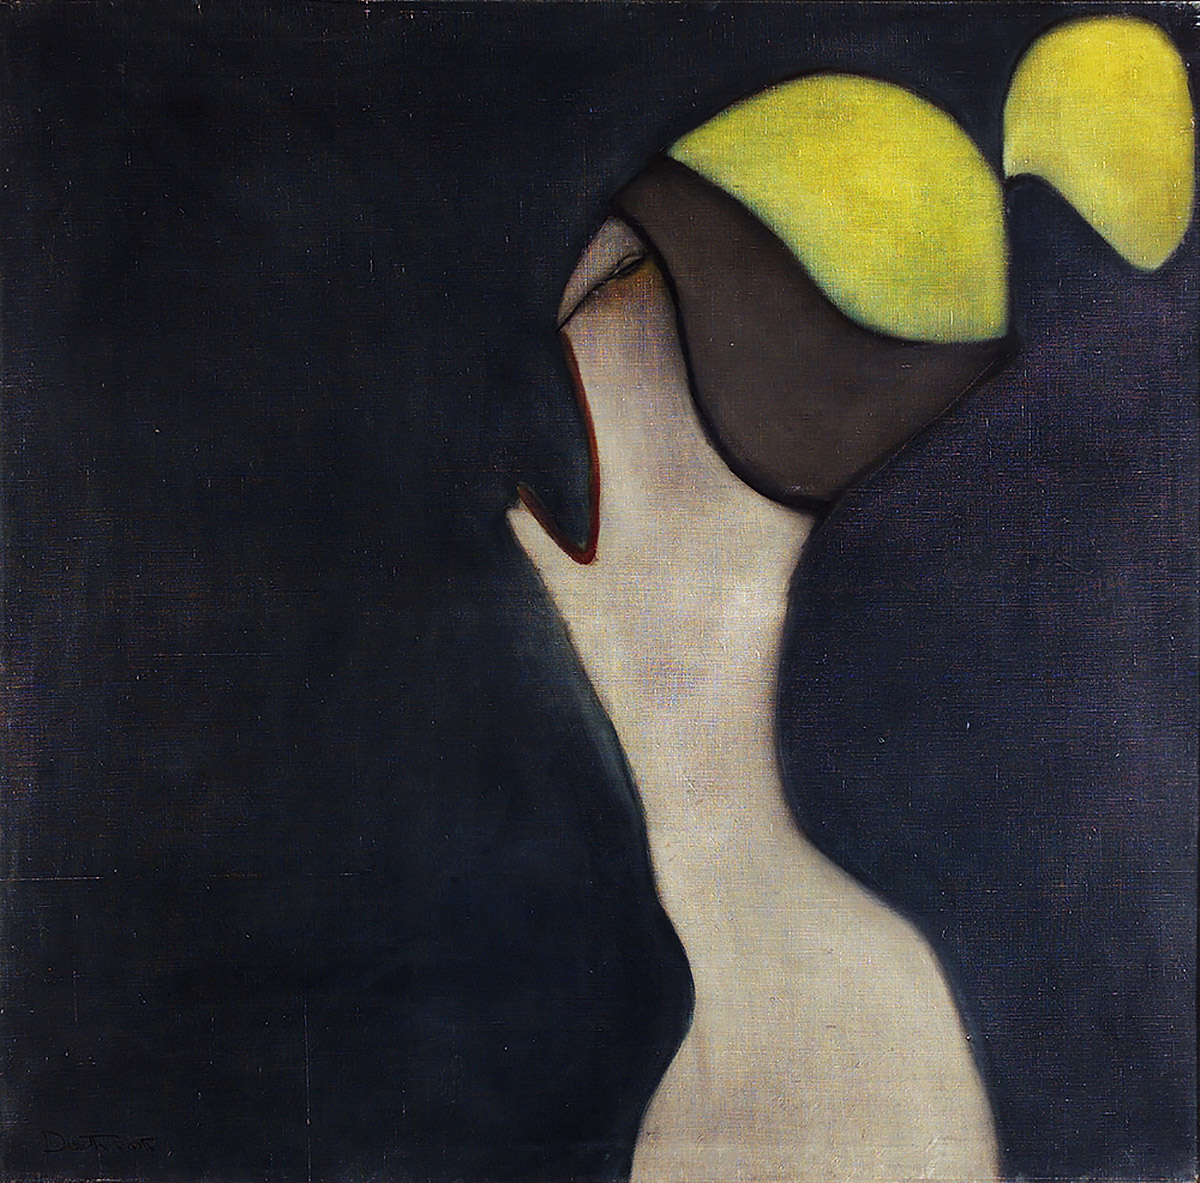 Pat Douthwaite, 'Yellow Hair', oil on canvas